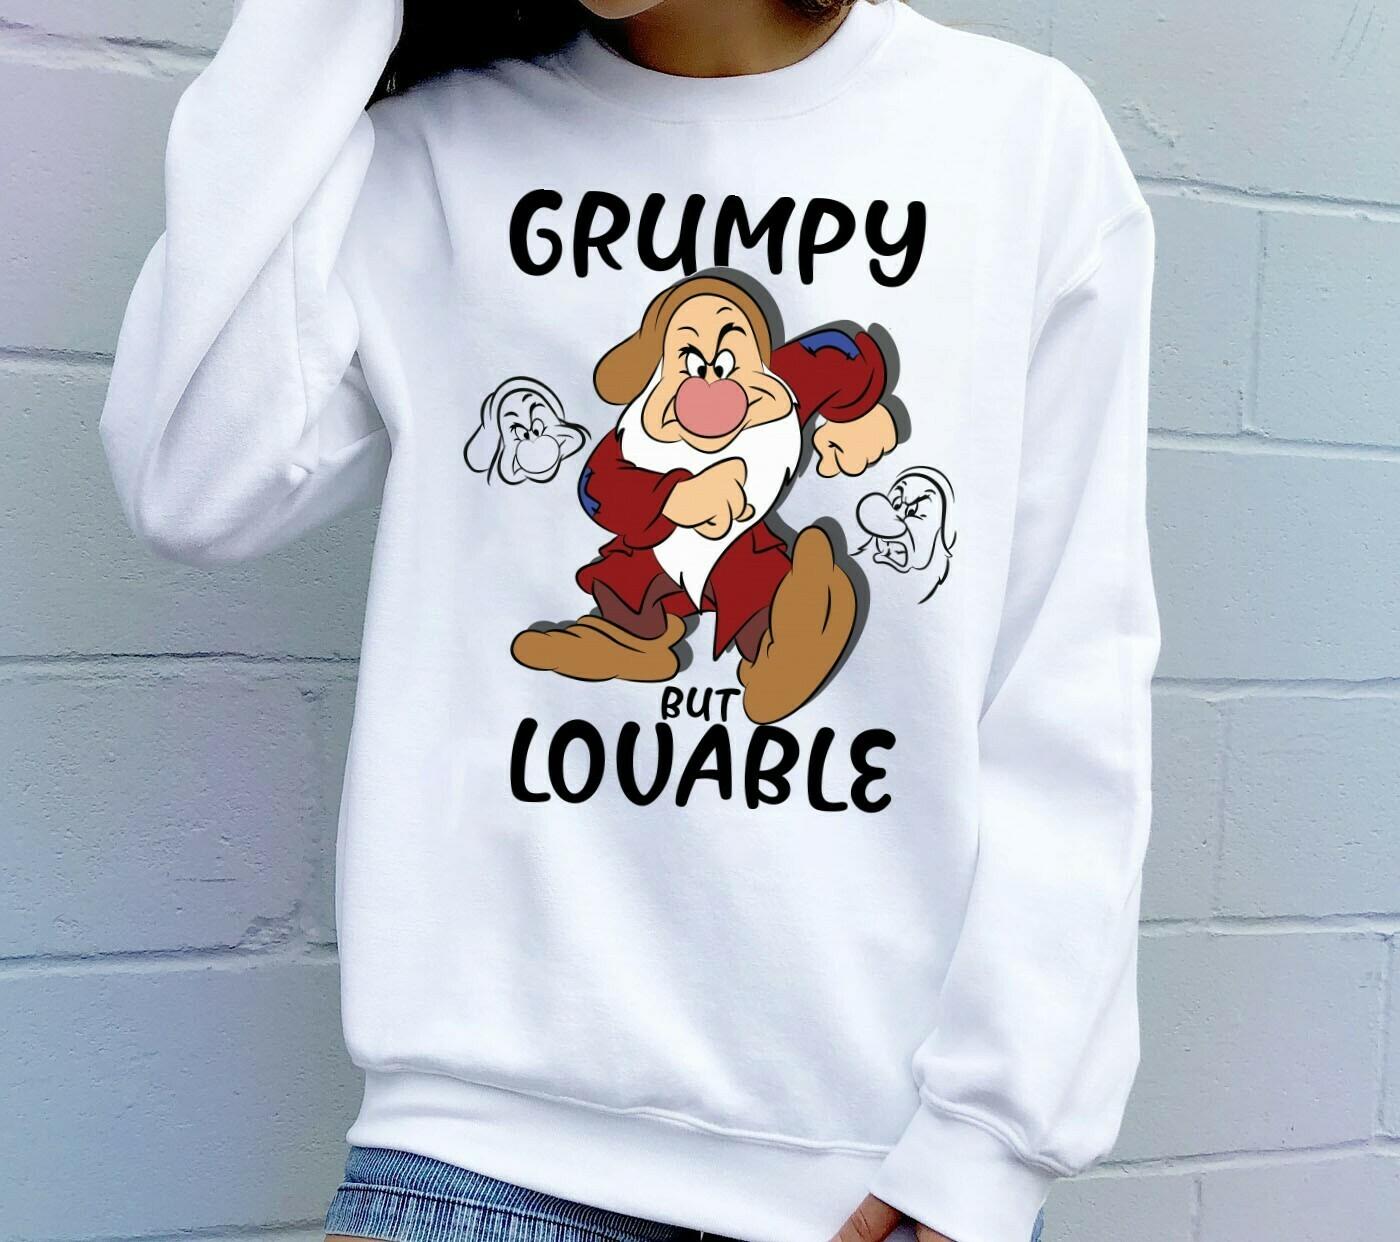 Disney Grumpy Dwarfs Grumpy But Lovable,Snow White and the Seven Dwarfs,Walt Disney World,Grumpy Old Man,Dopey Seven Dwarfs T Shirt Long Sleeve Sweatshirt Hoodie Jolly Family Gifts